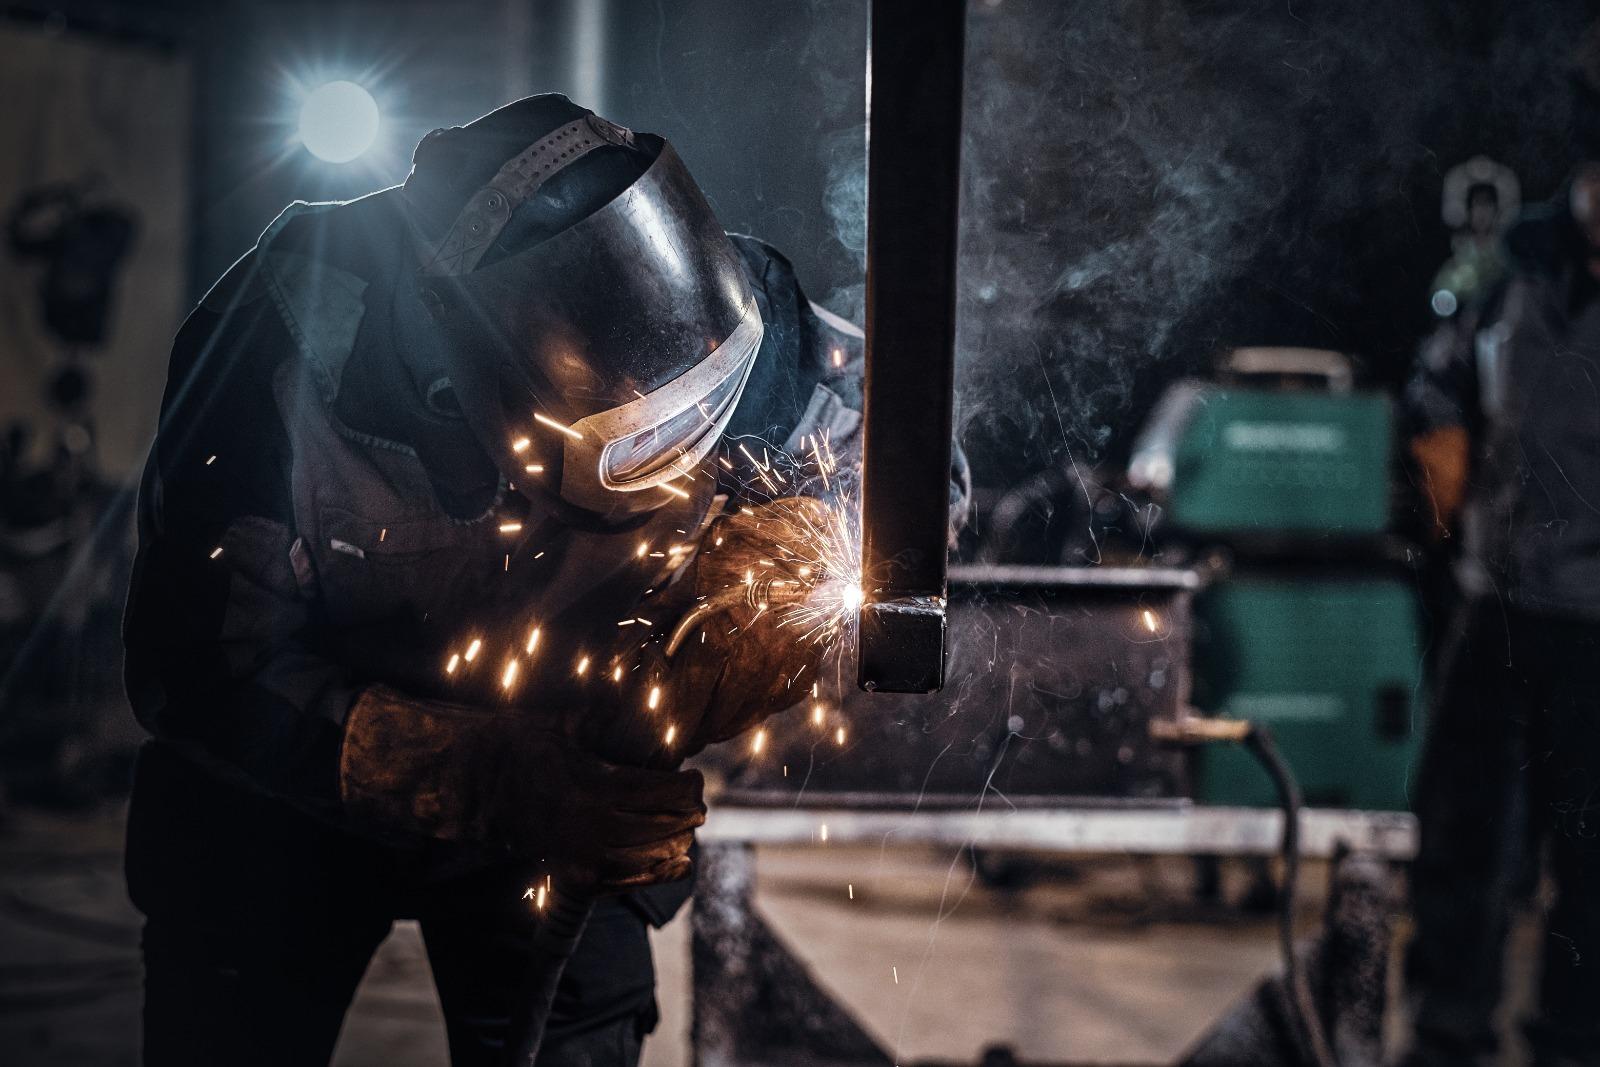 Fabricator/Welder